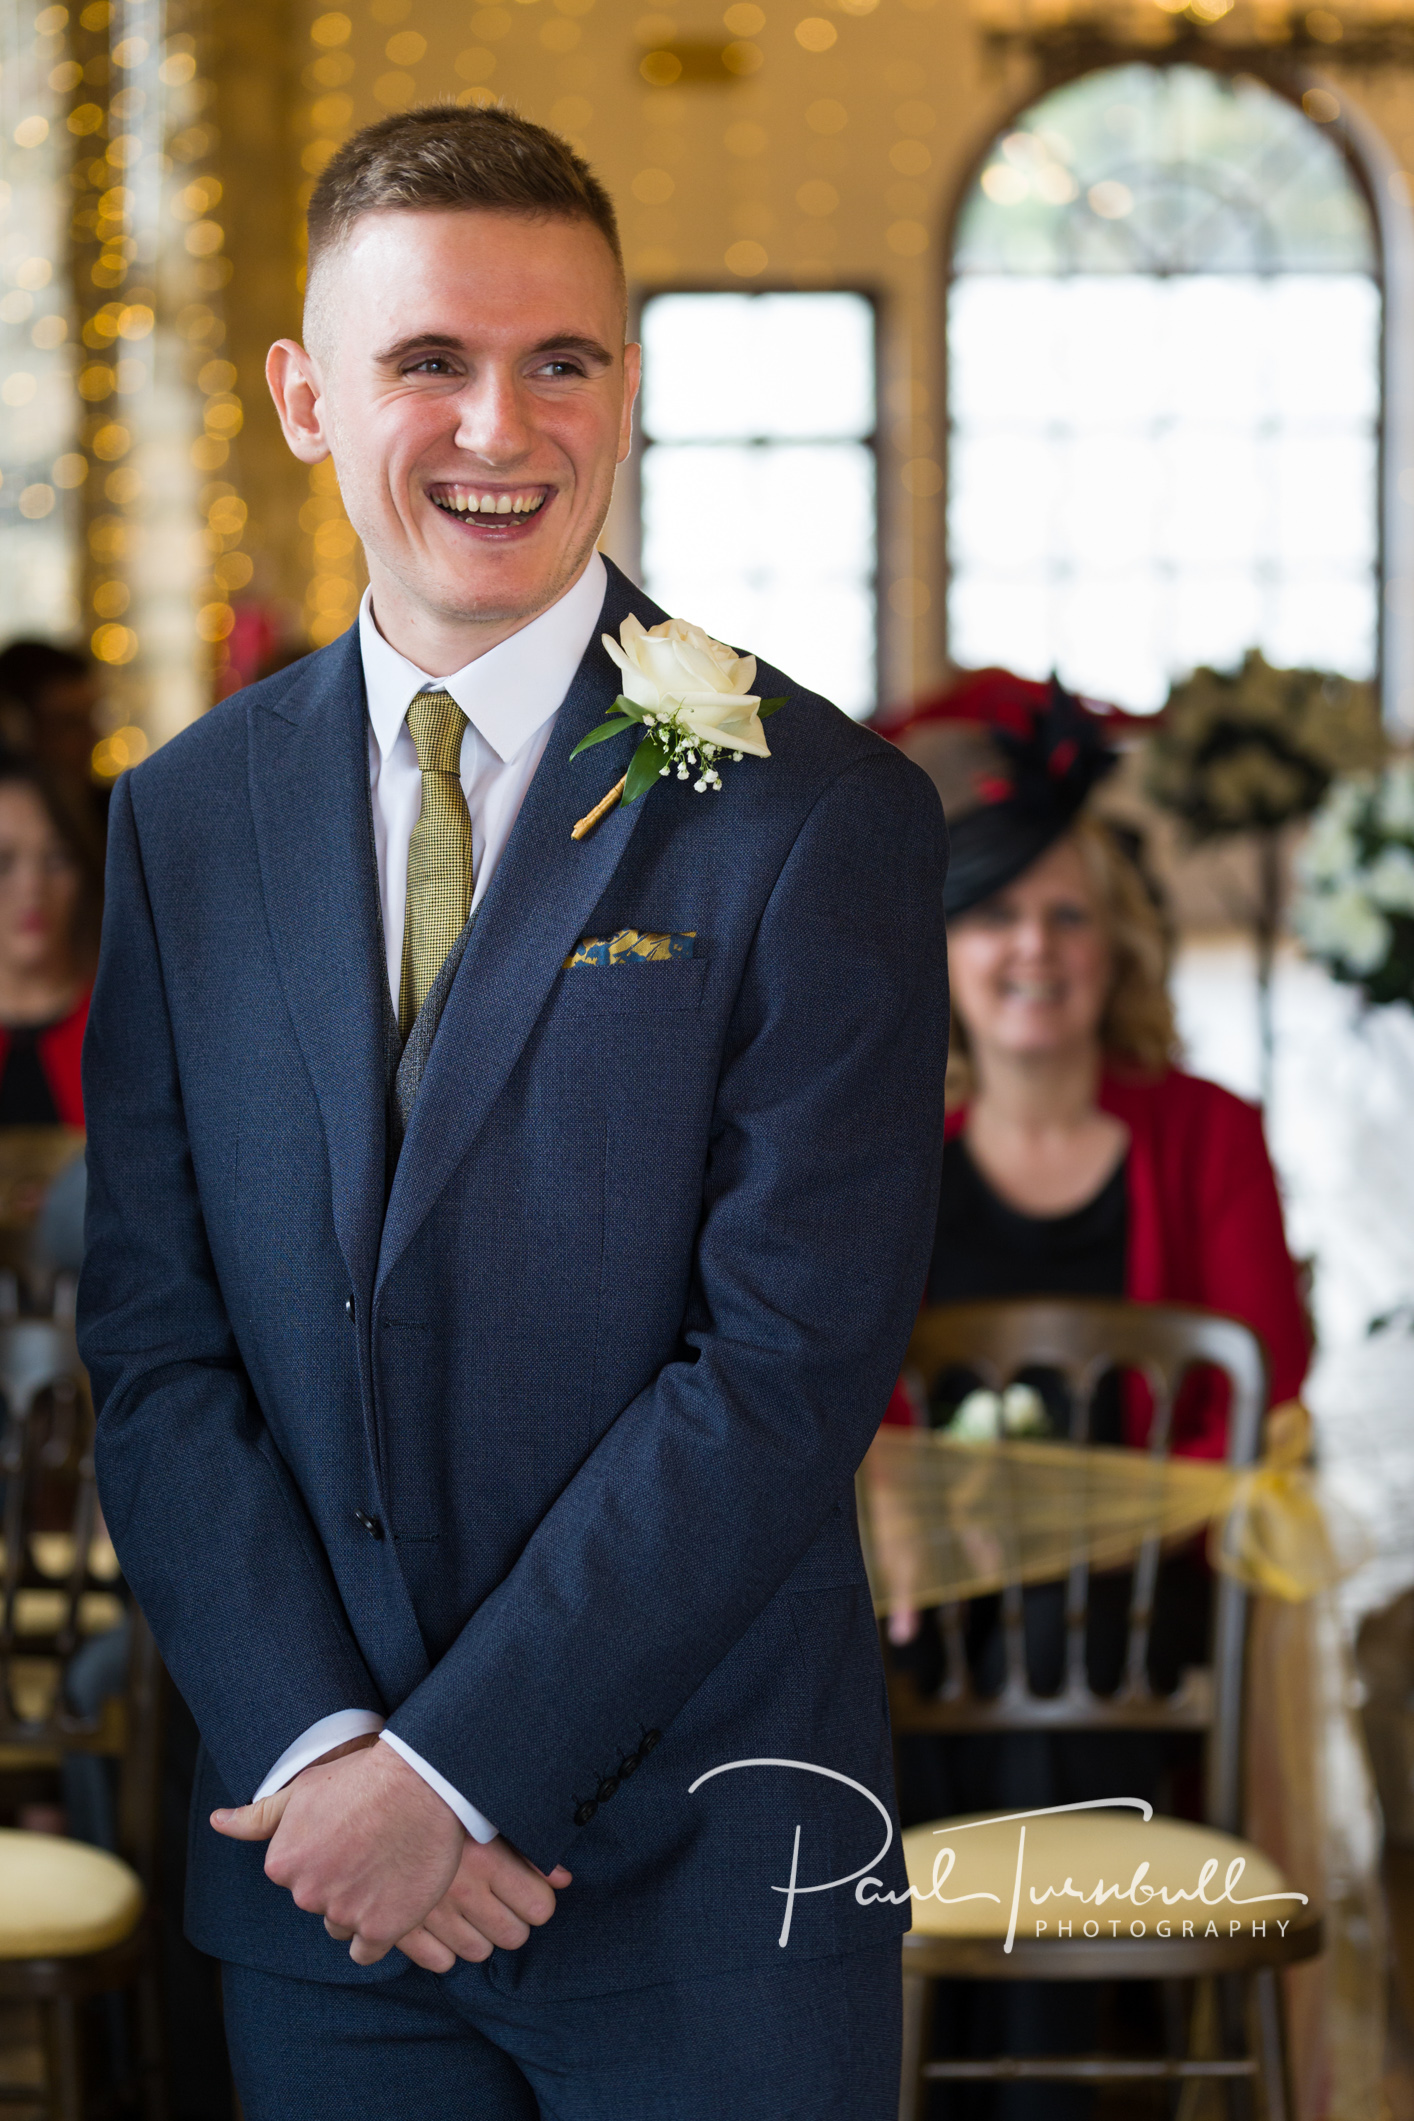 wedding-photographer-raven-hall-ravenscroft--scarborough-yorkshire-lucy-ryan-024.jpg